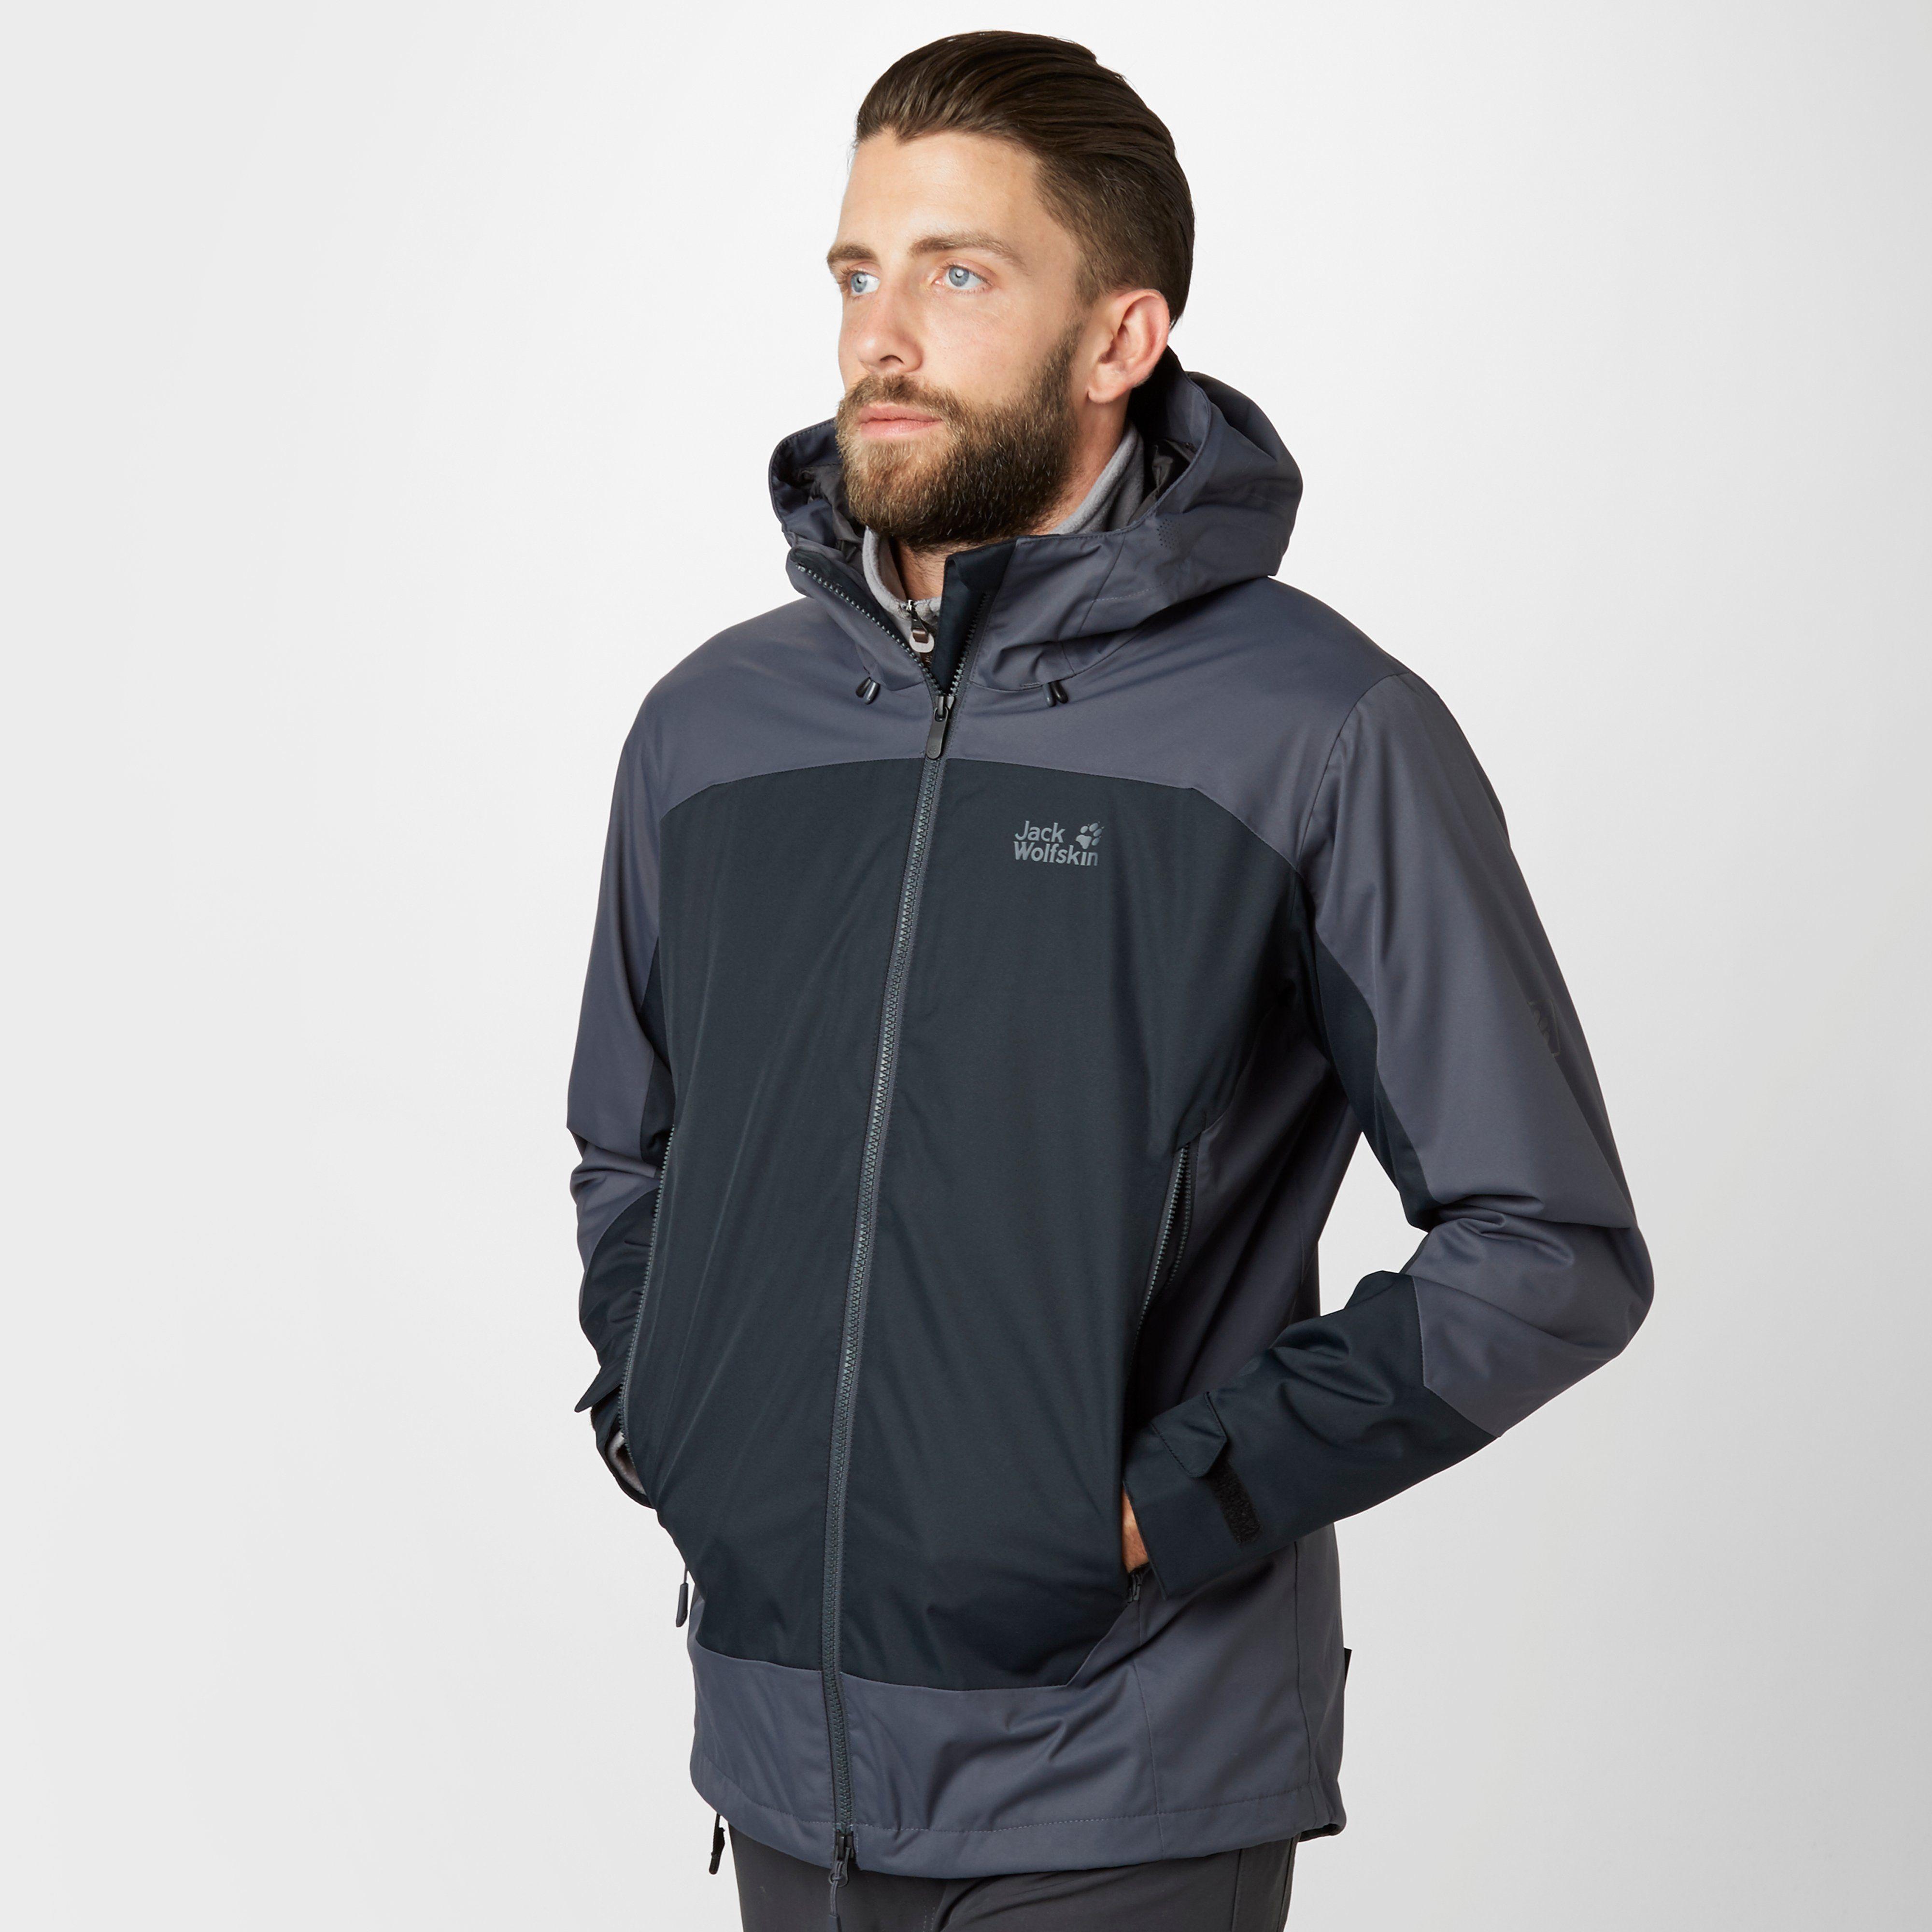 JACK WOLFSKIN Men's North Slope Texapore® Jacket